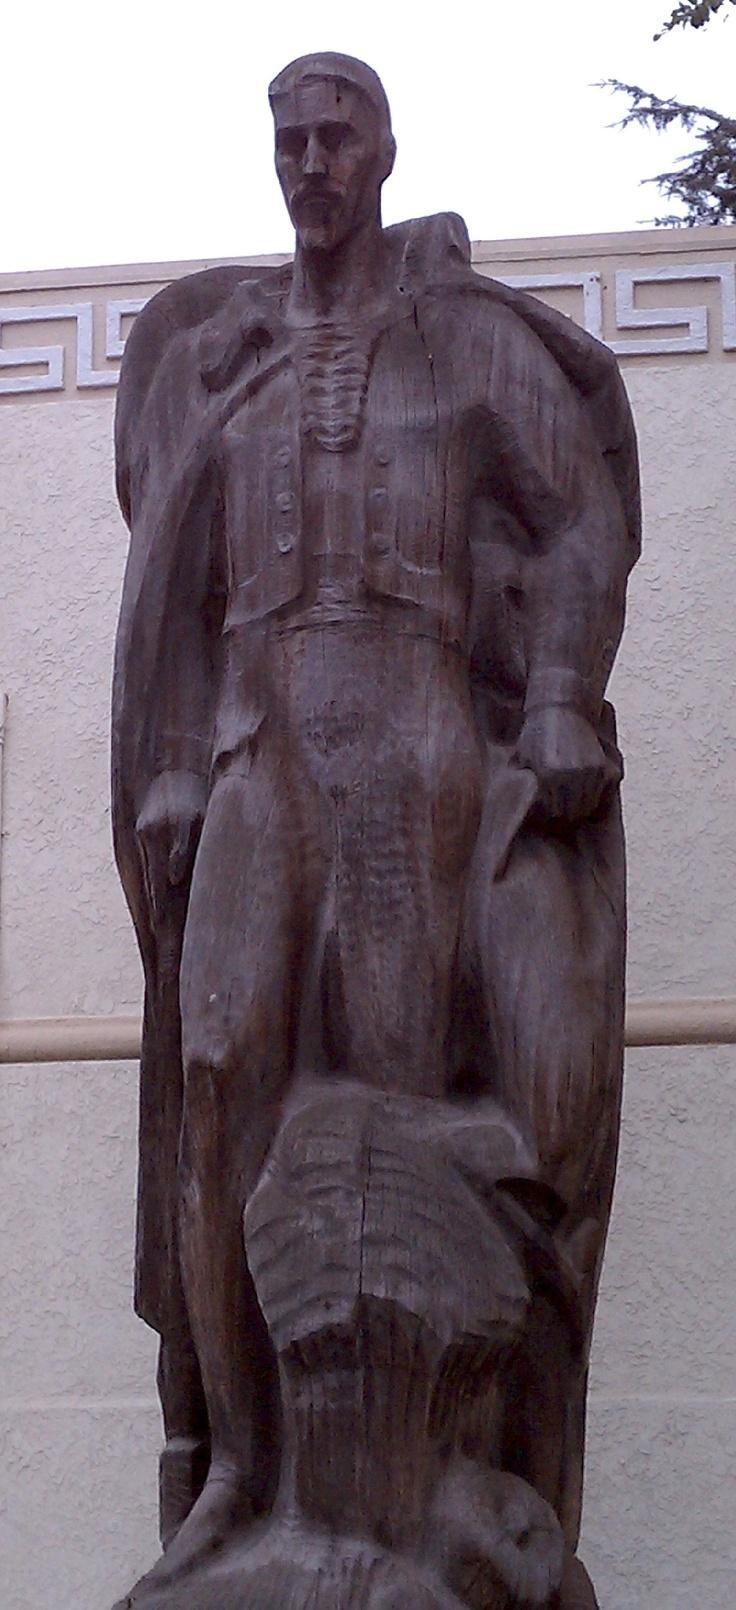 LA County Fair Art at 90 – Where it All Began. John Edward Svenson, The Ranchero sculpture in wood, Millard Sheets Center for the Arts, 1953 (photograph 2010)